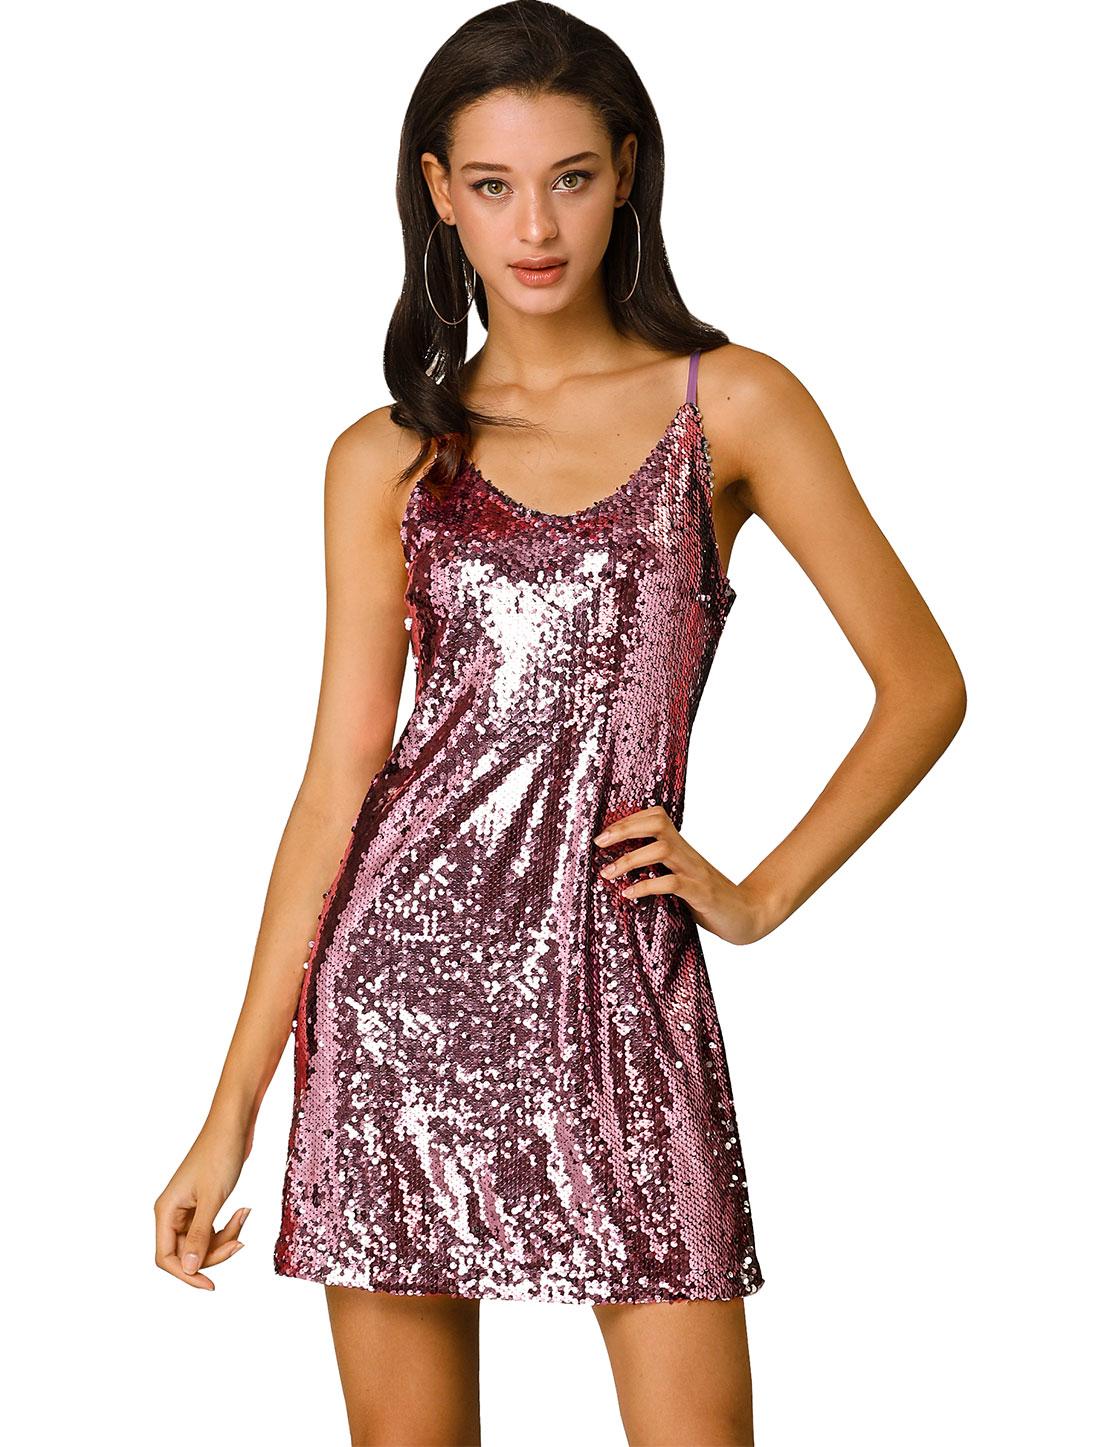 Women's Glitter Sequin V Neck Spaghetti Strap Party Dress Light Pinks L